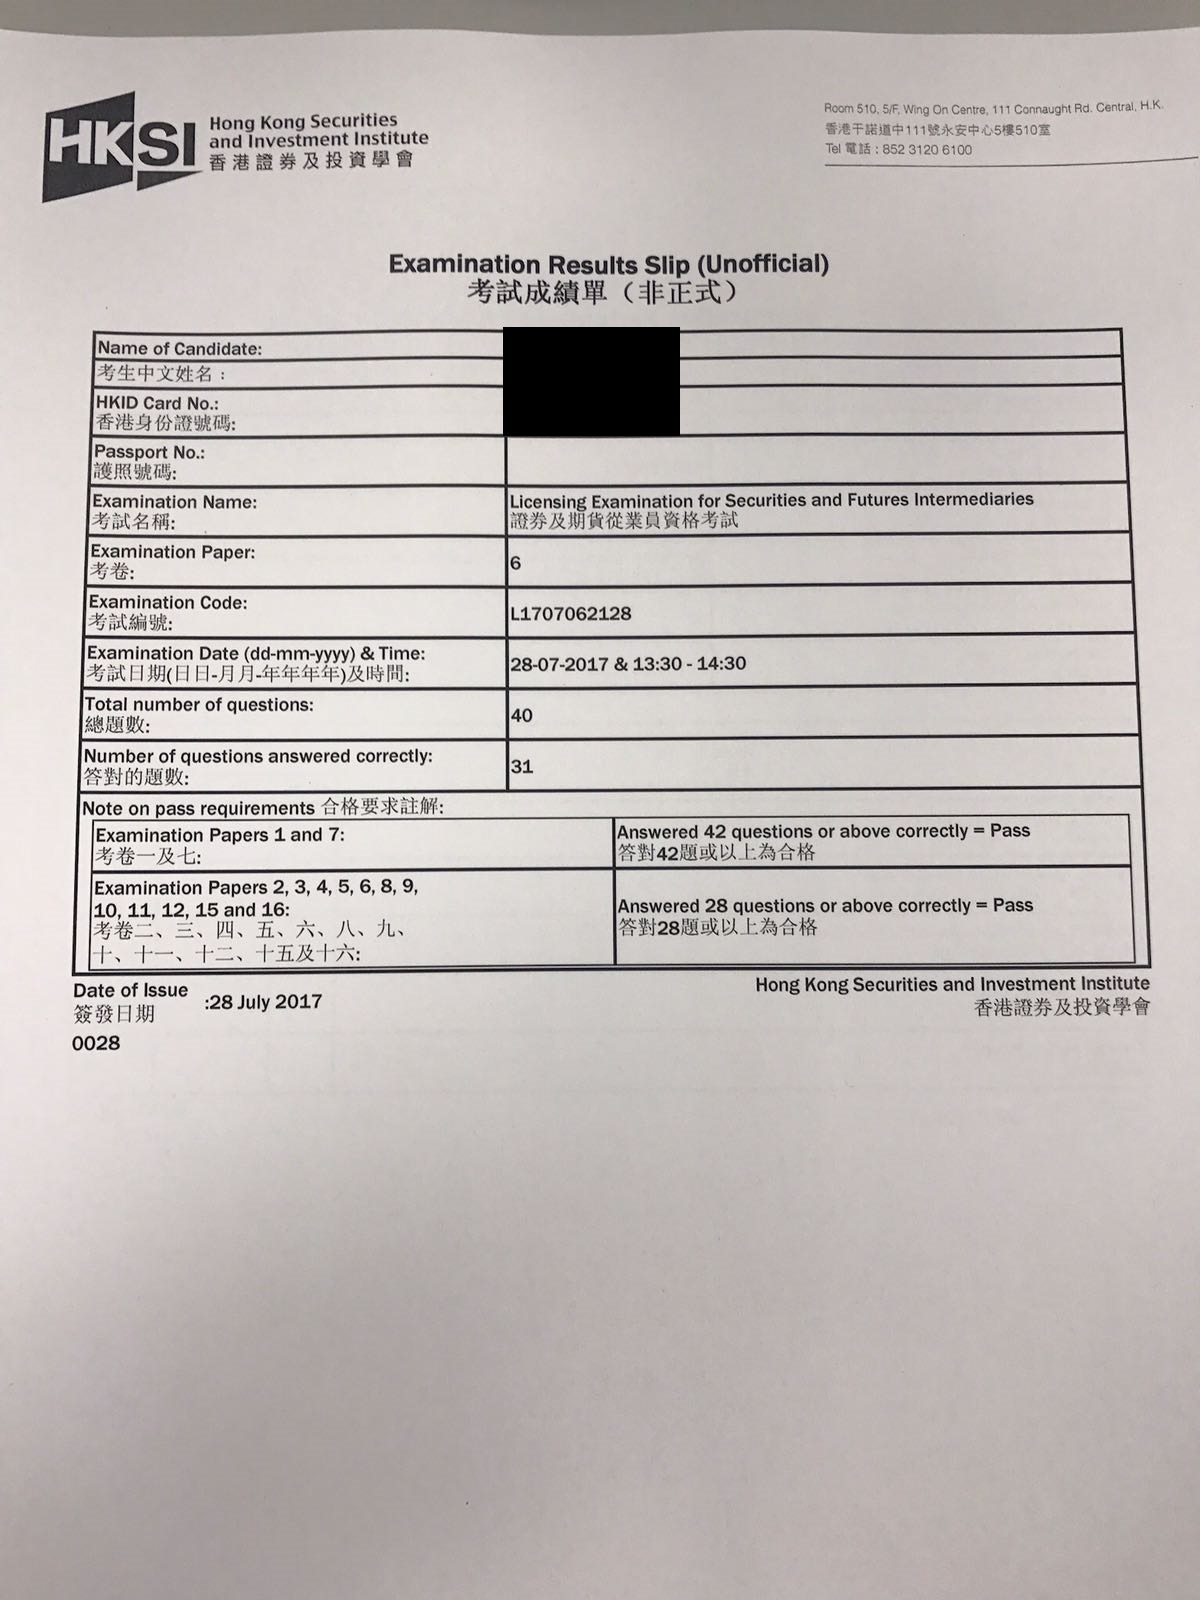 SJ 28/7/2017 LE Paper 6 證券期貨從業員資格考試卷六 Pass